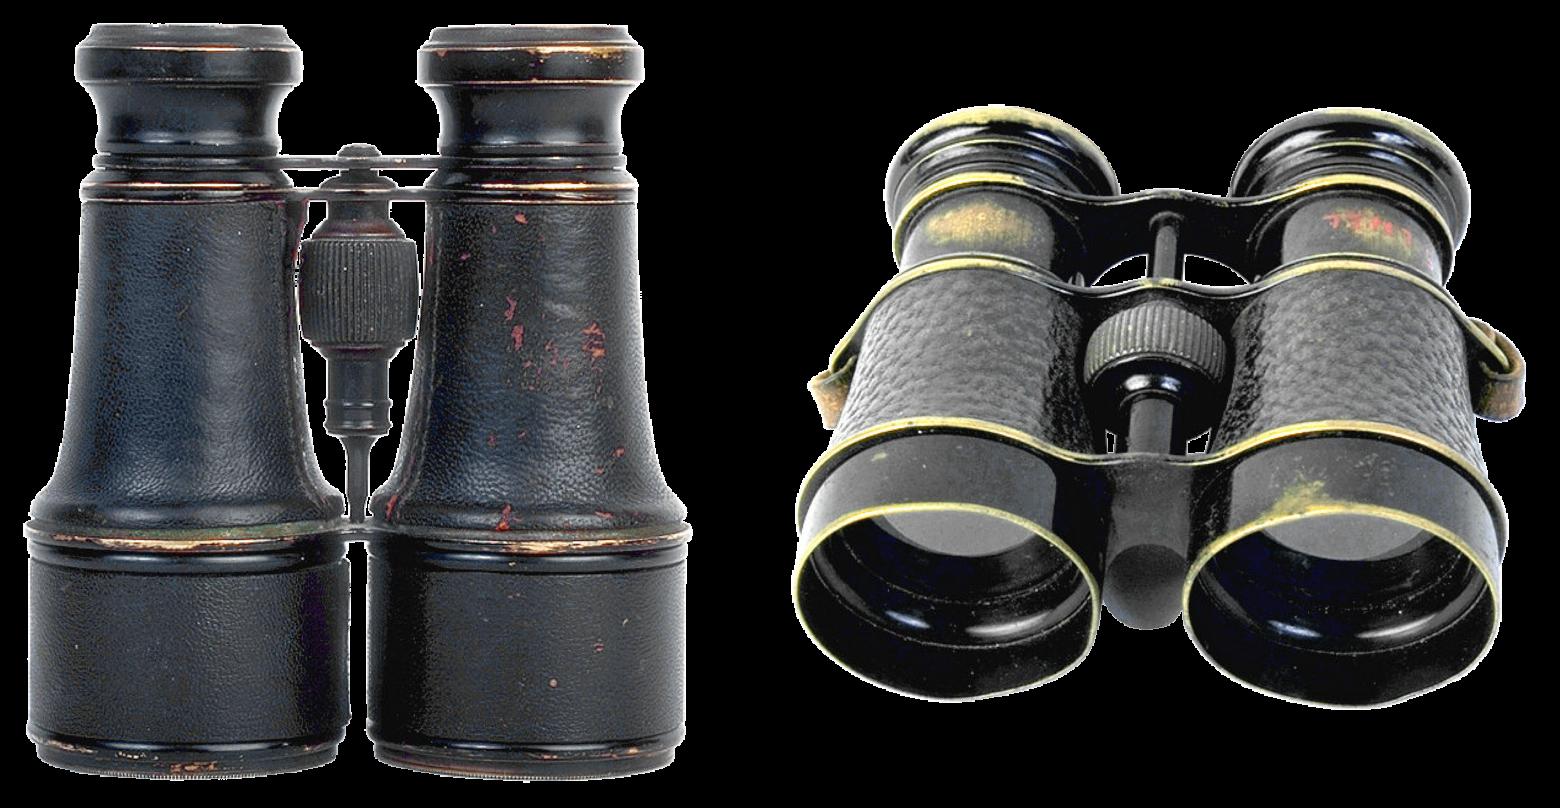 binoculars-1741035